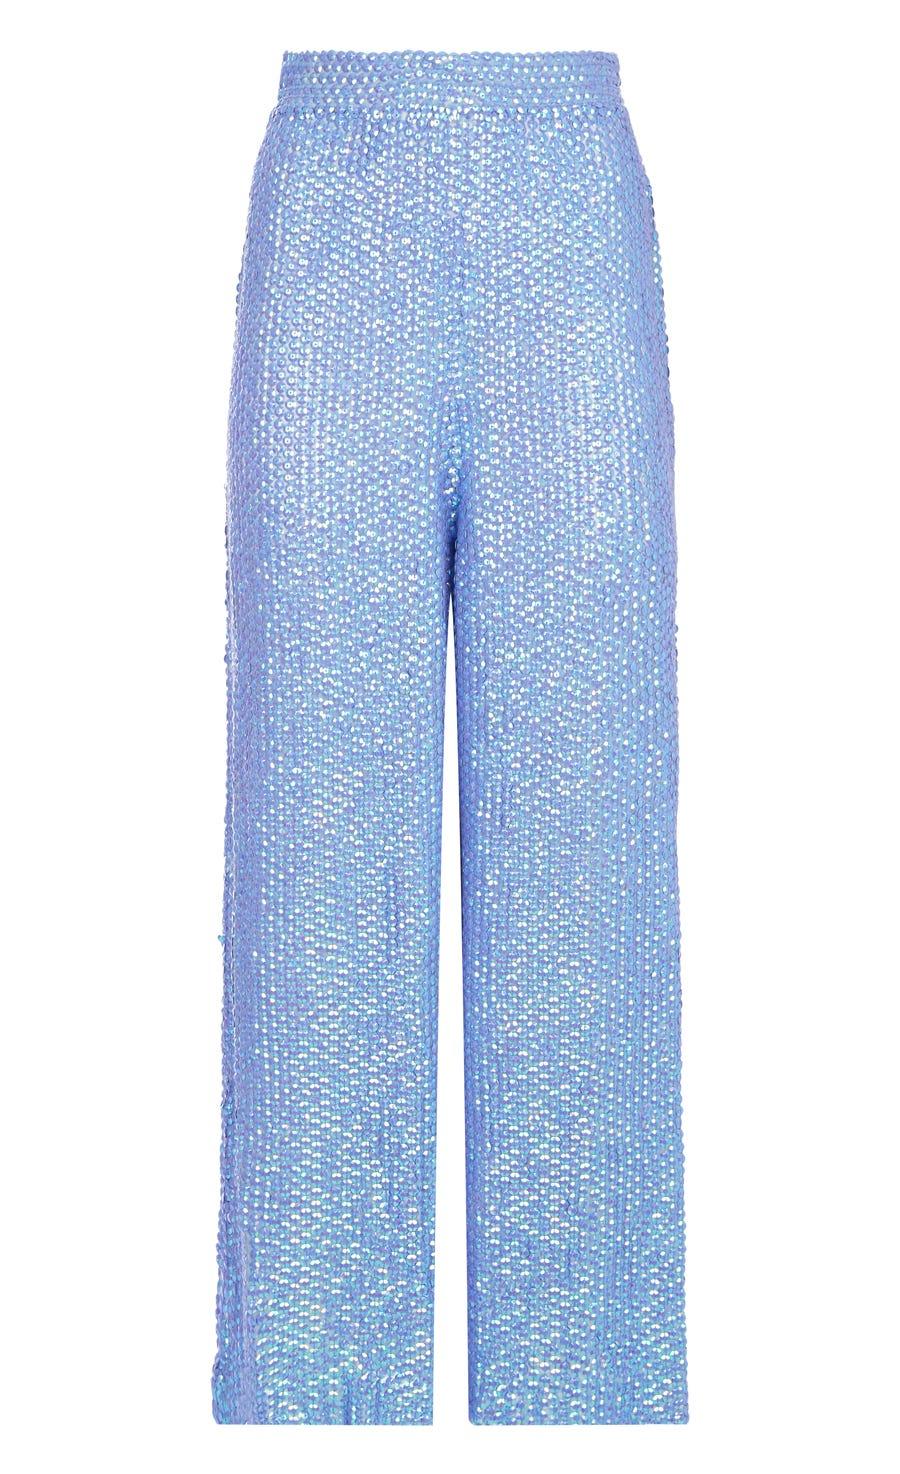 Tiara Trousers, Periwinkle